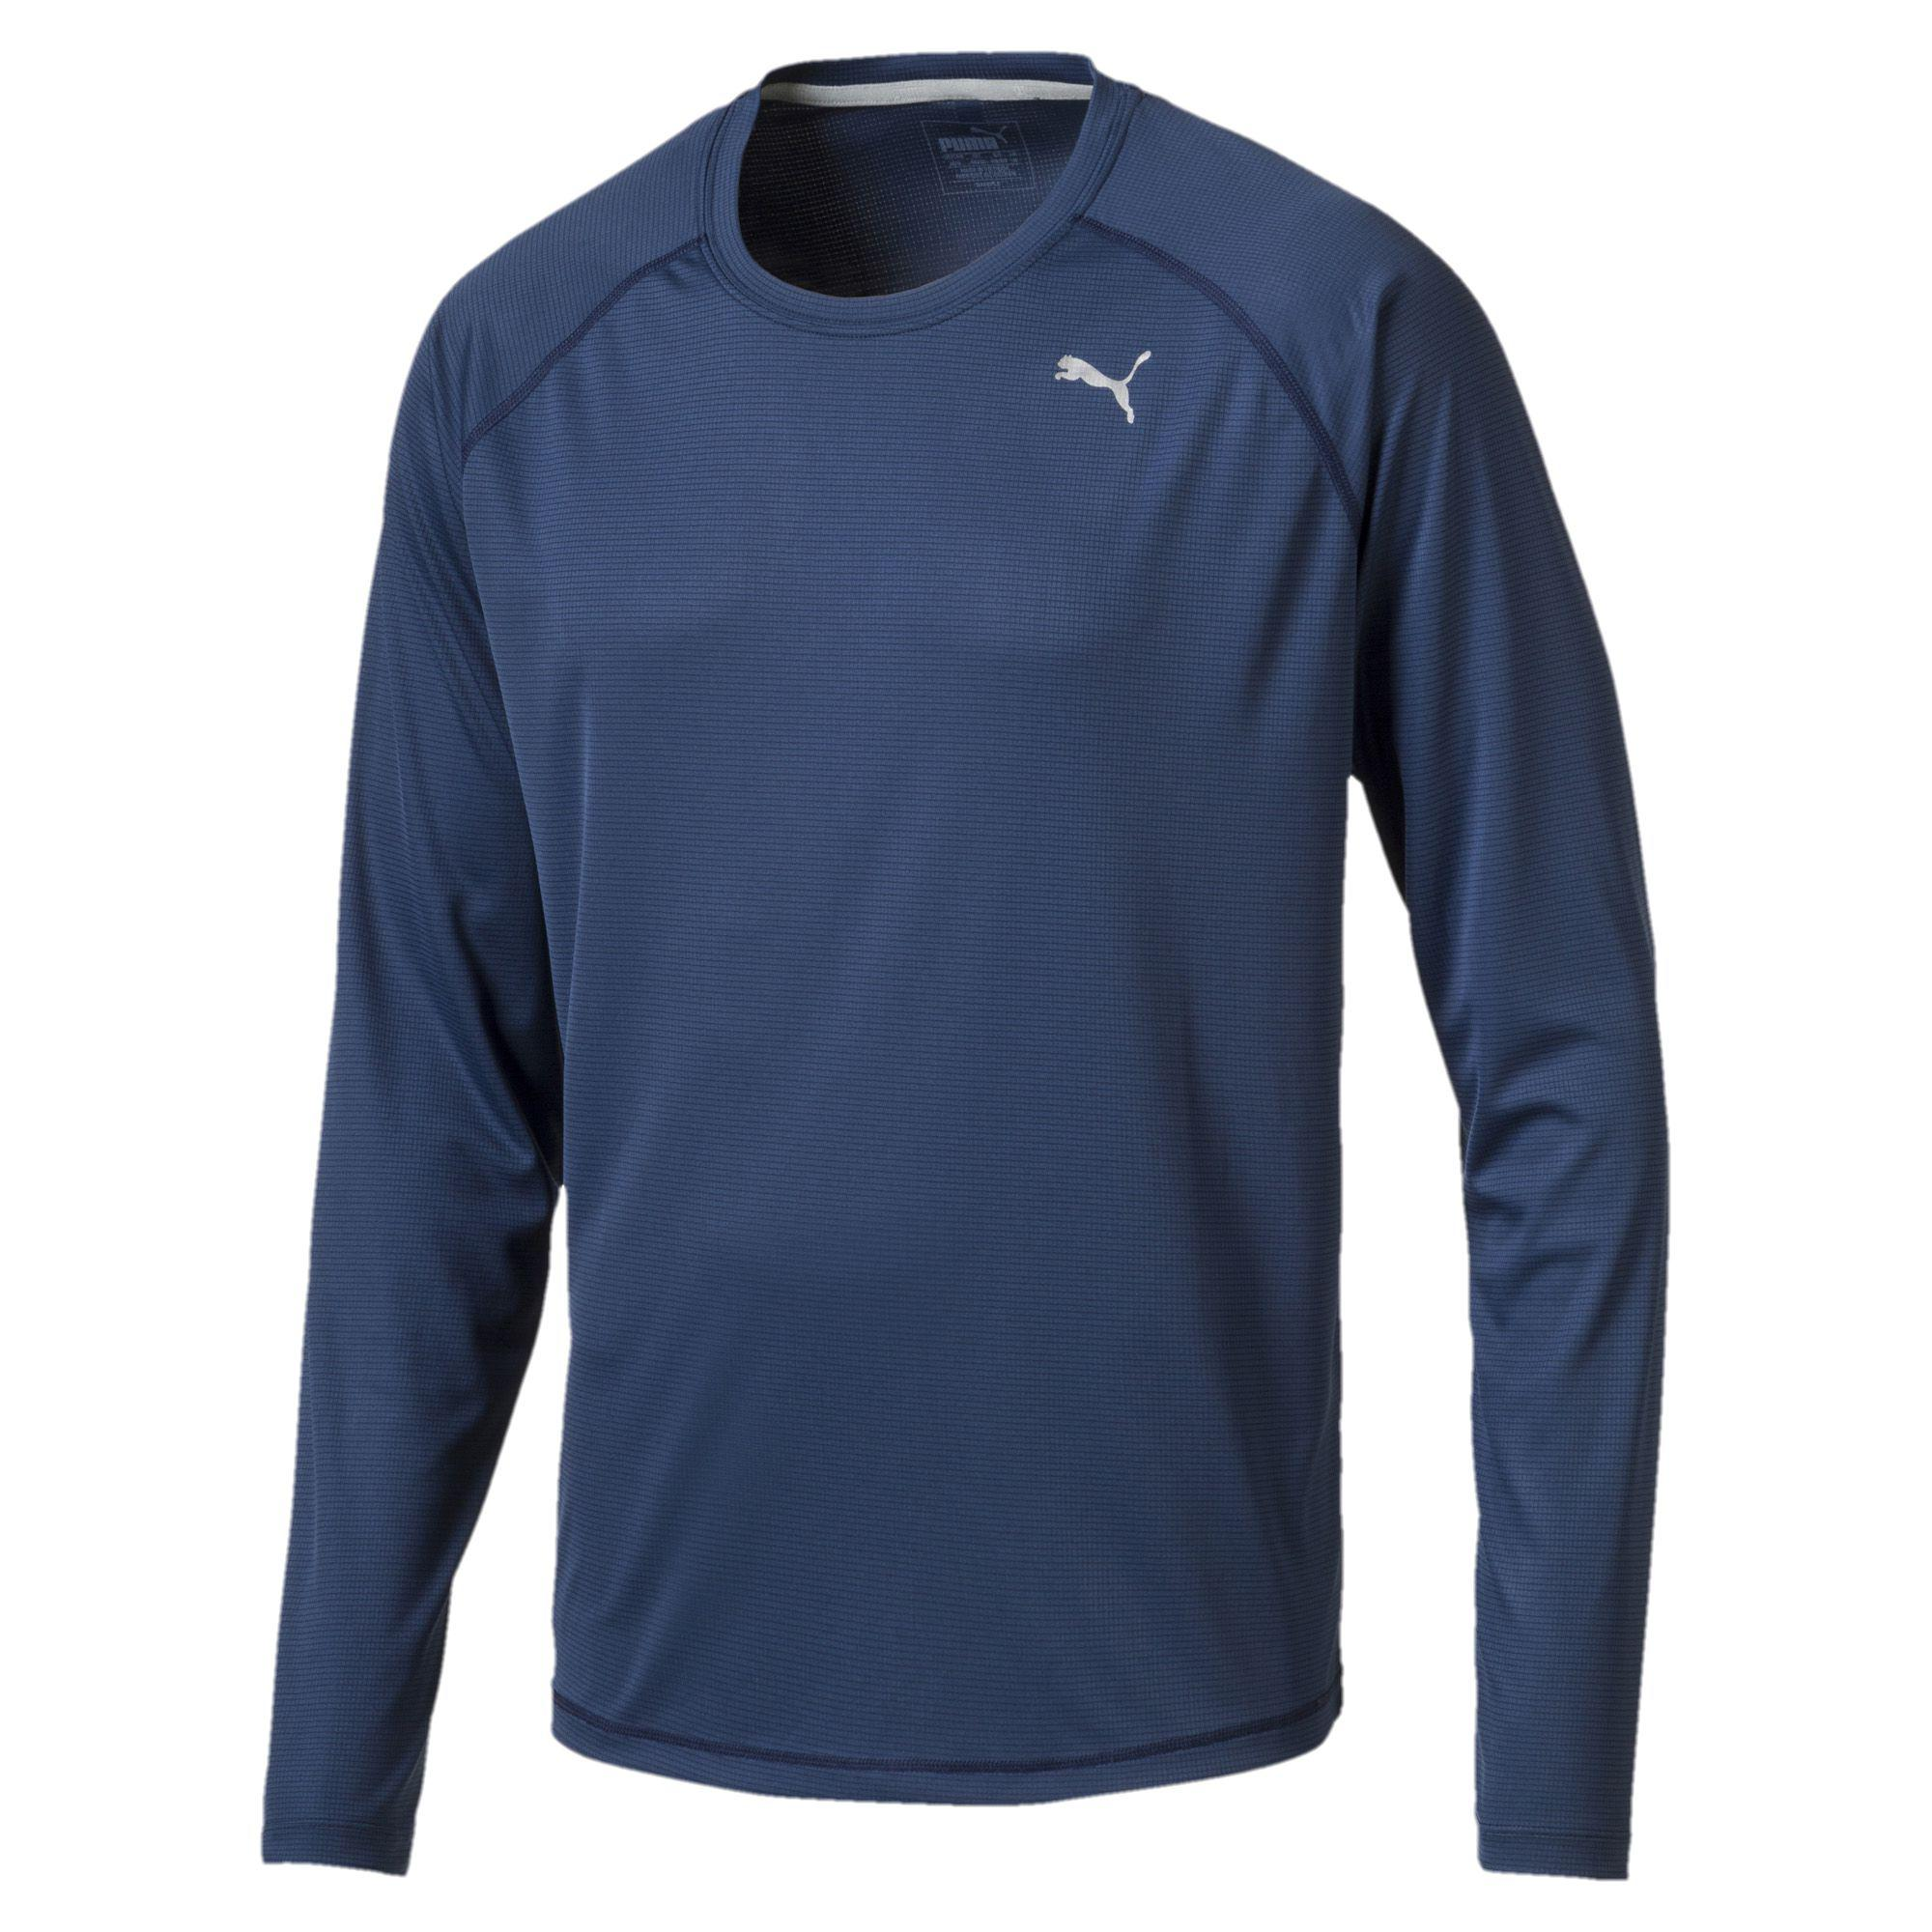 a0e06766ffa2 Lyst - PUMA Core-run Men s Long Sleeve Running Top in Blue for Men